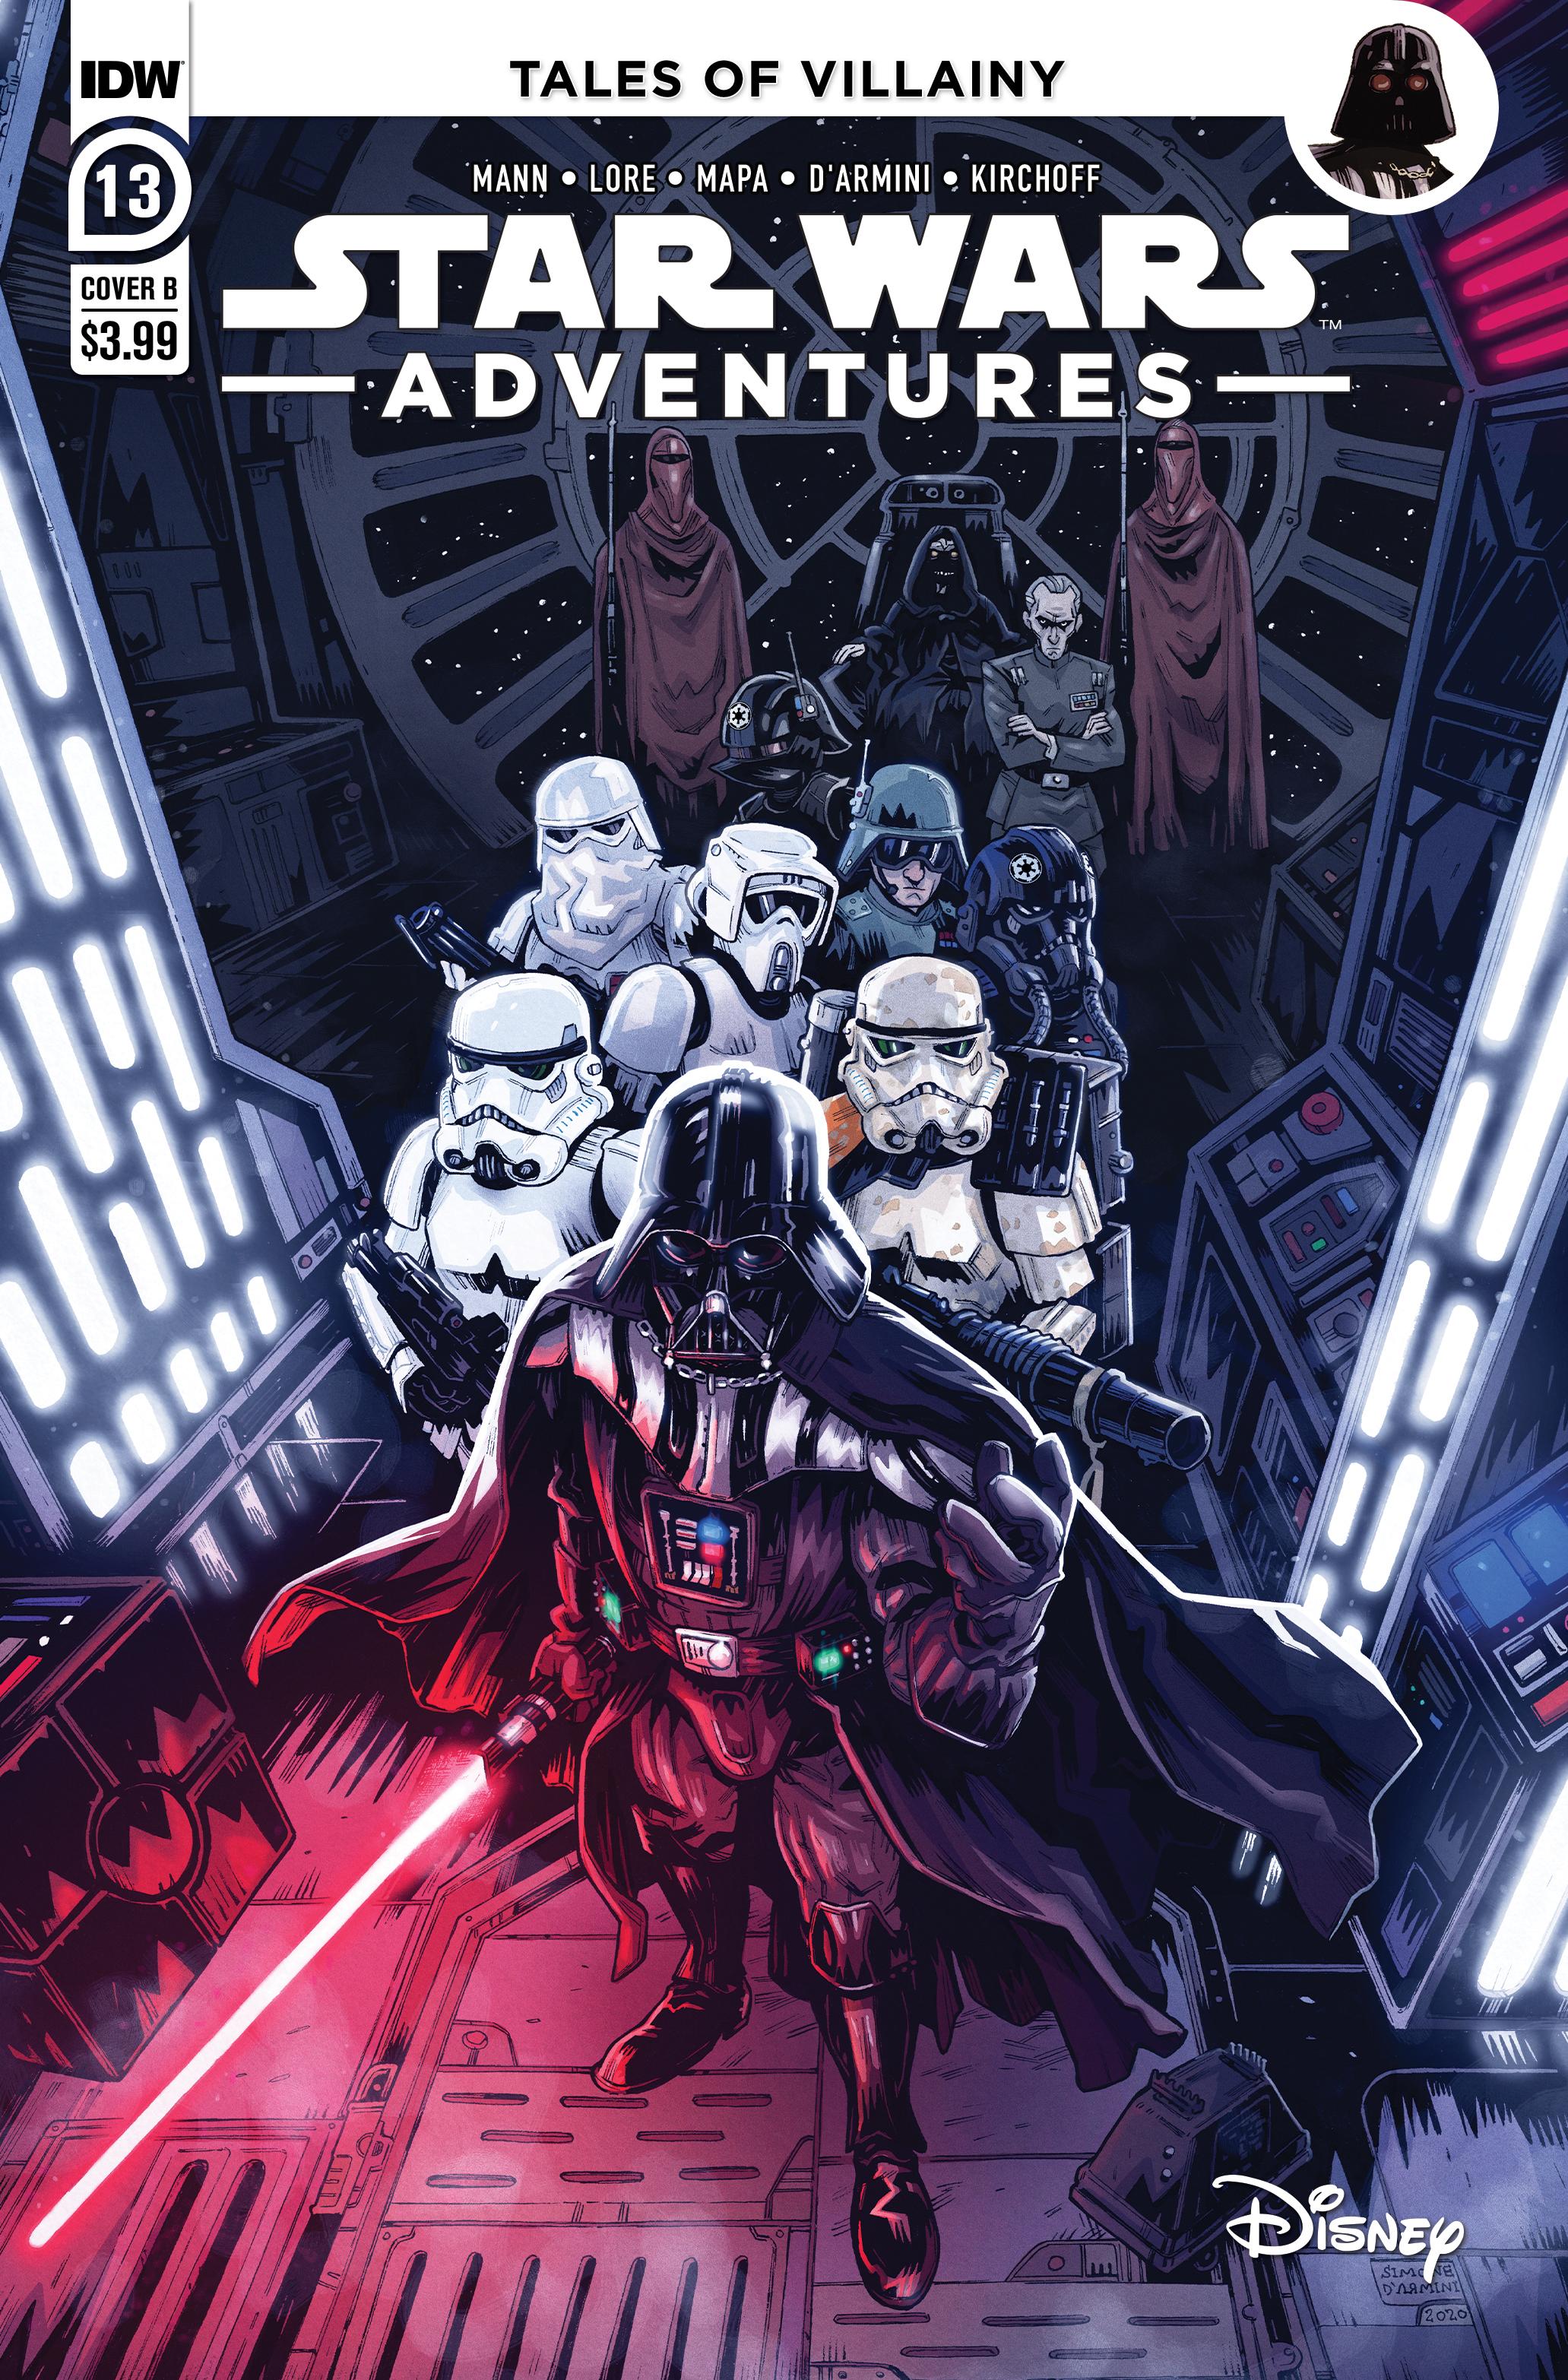 Star Wars Adventures #13 (Cover B by Simone D'Armini) (22.12.2021)